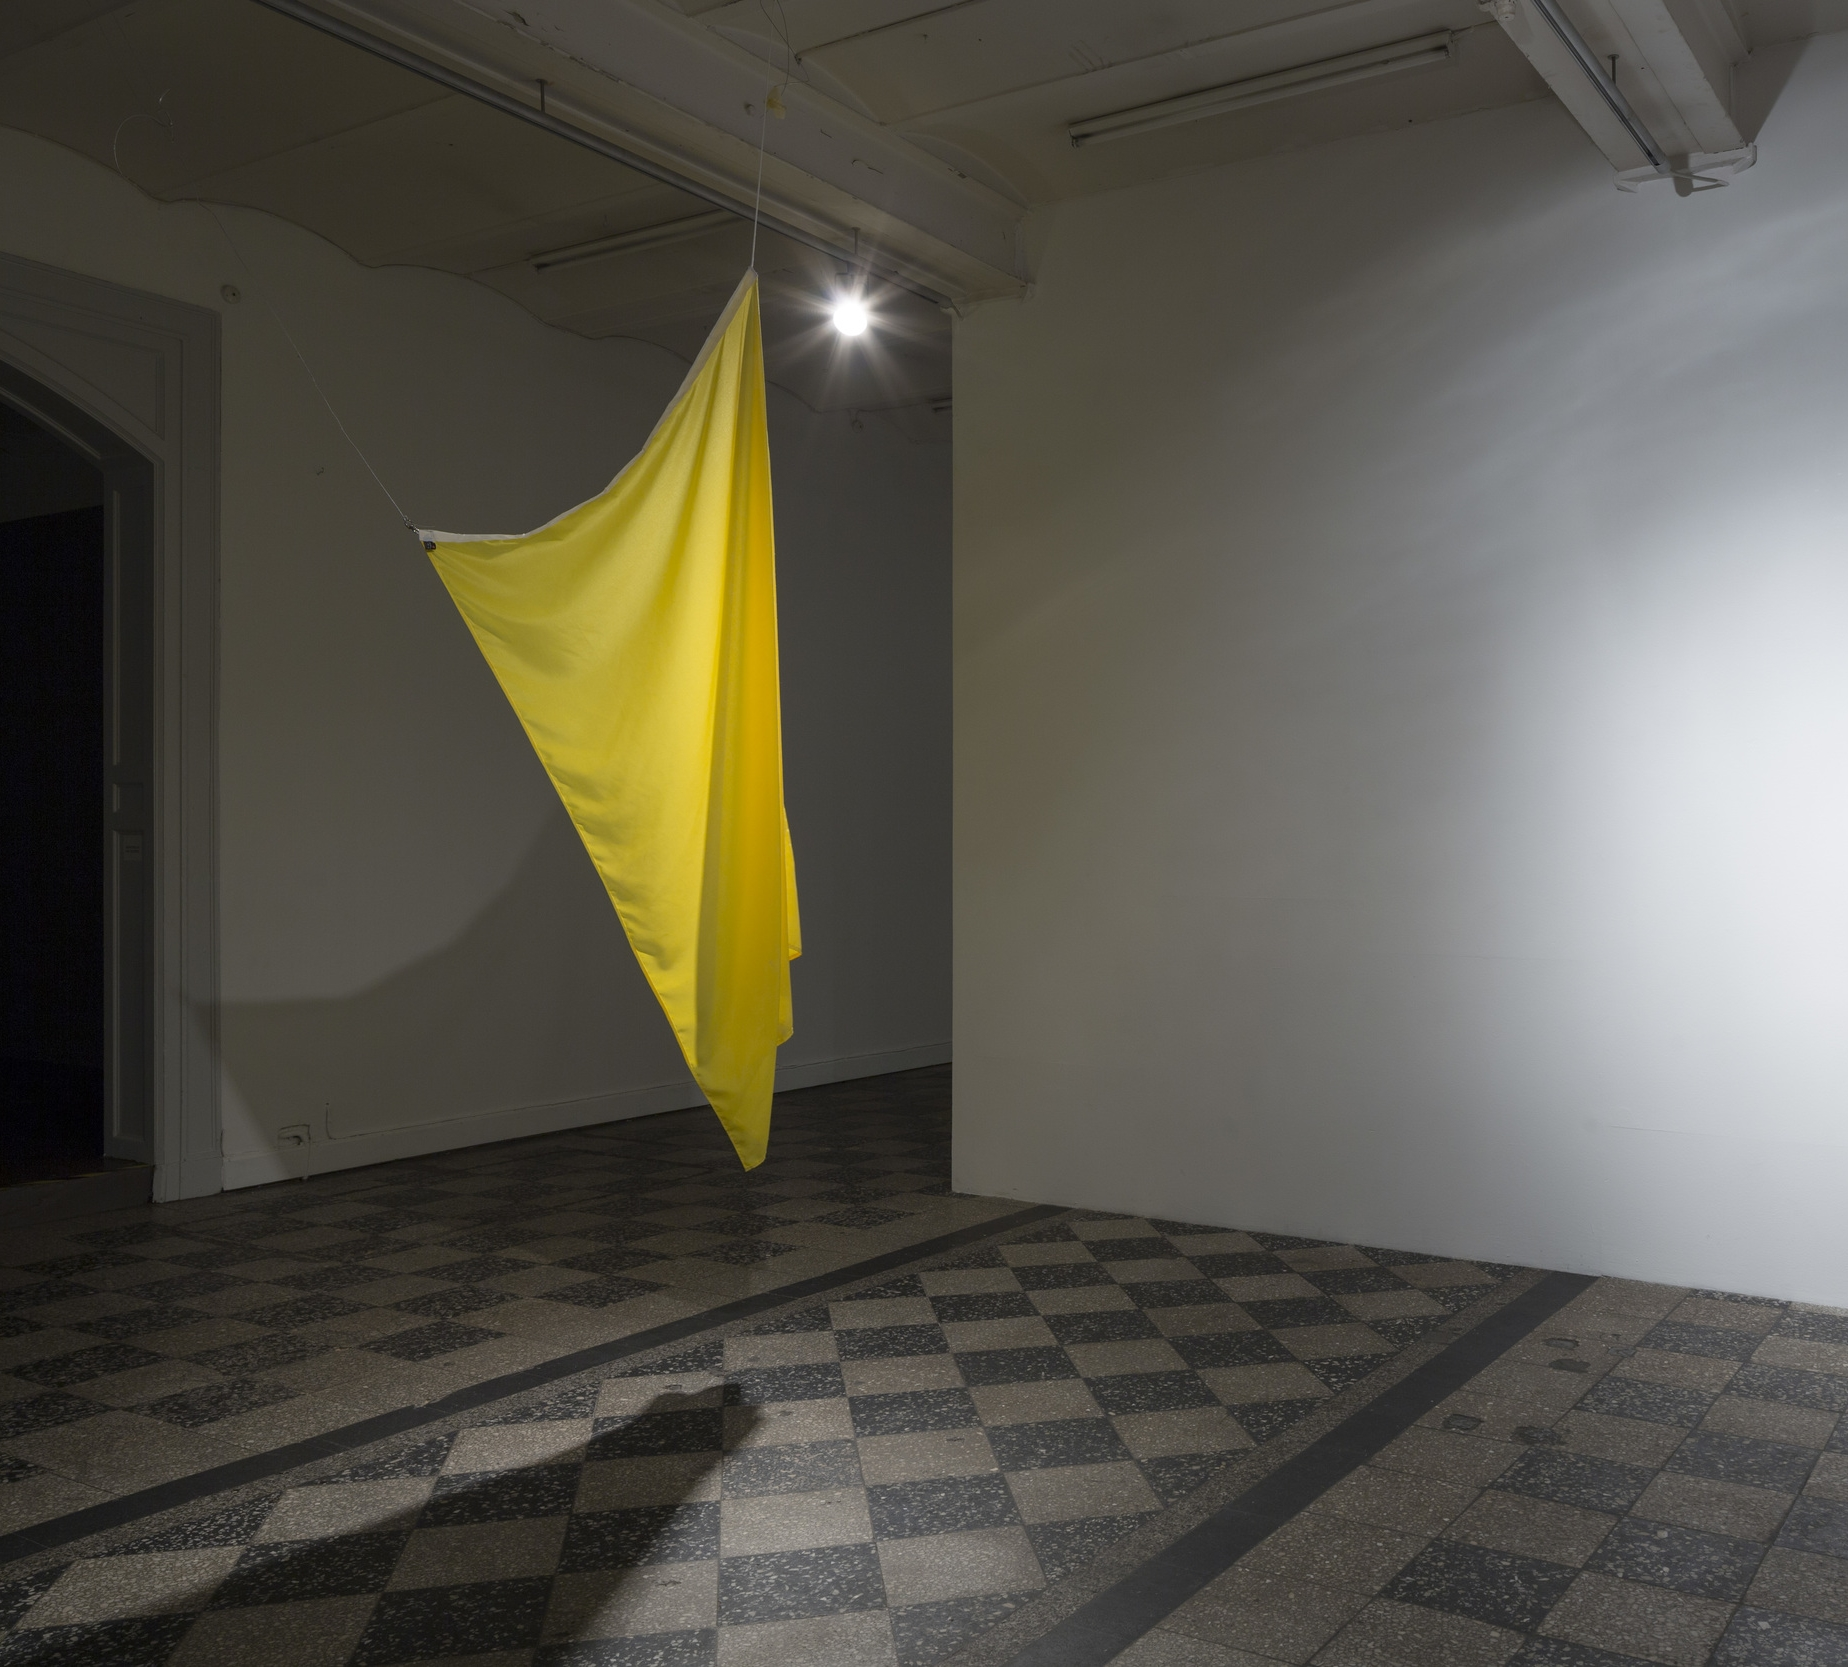 QUEBEC Dimention: 200x100 cm Materials: Nylonflag, wire.